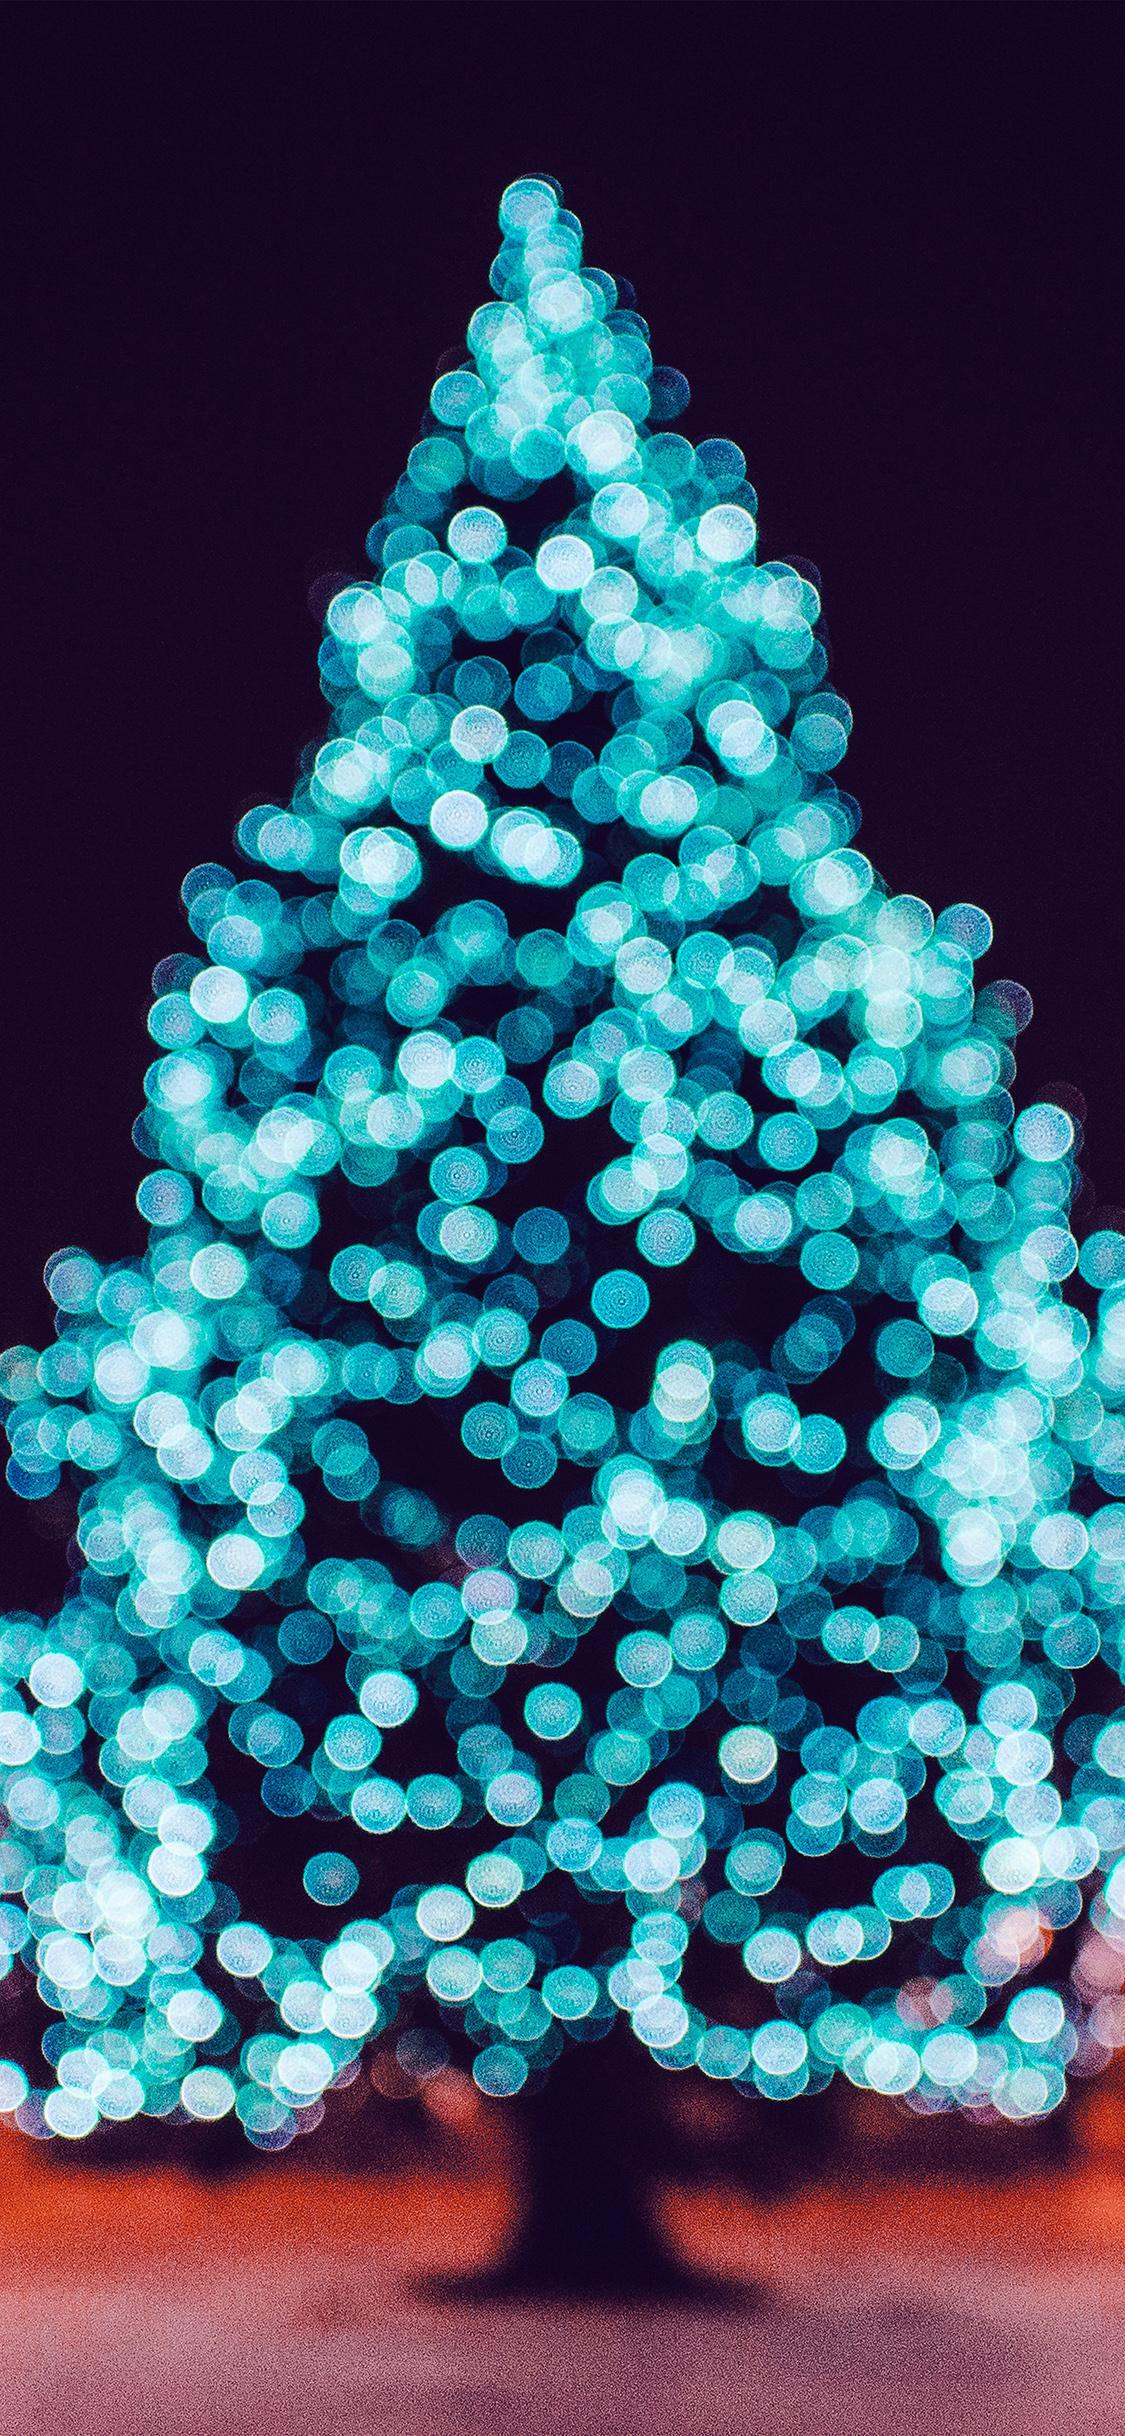 Iphonexpapers Com Iphone X Wallpaper Nl36 City Tree Bokeh Winter Art Christmas Color